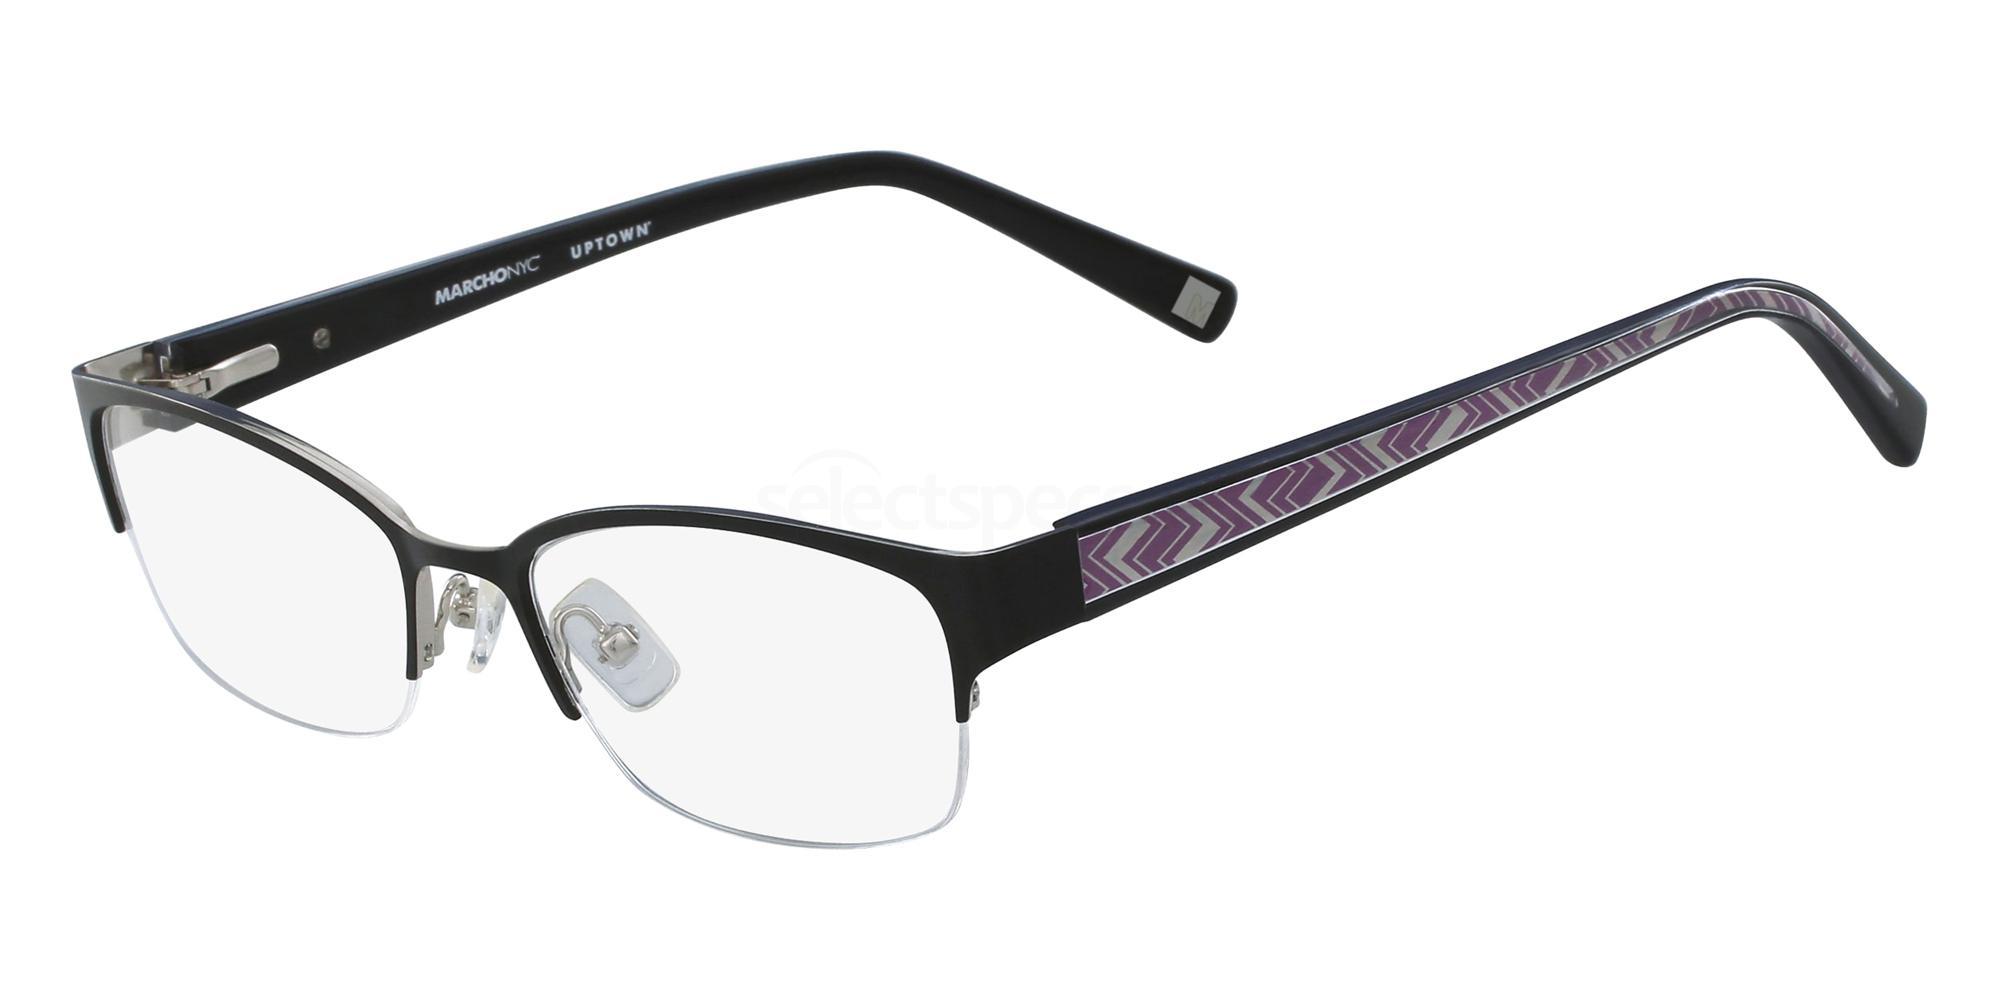 001 M-YORKVILLE Glasses, Marchon